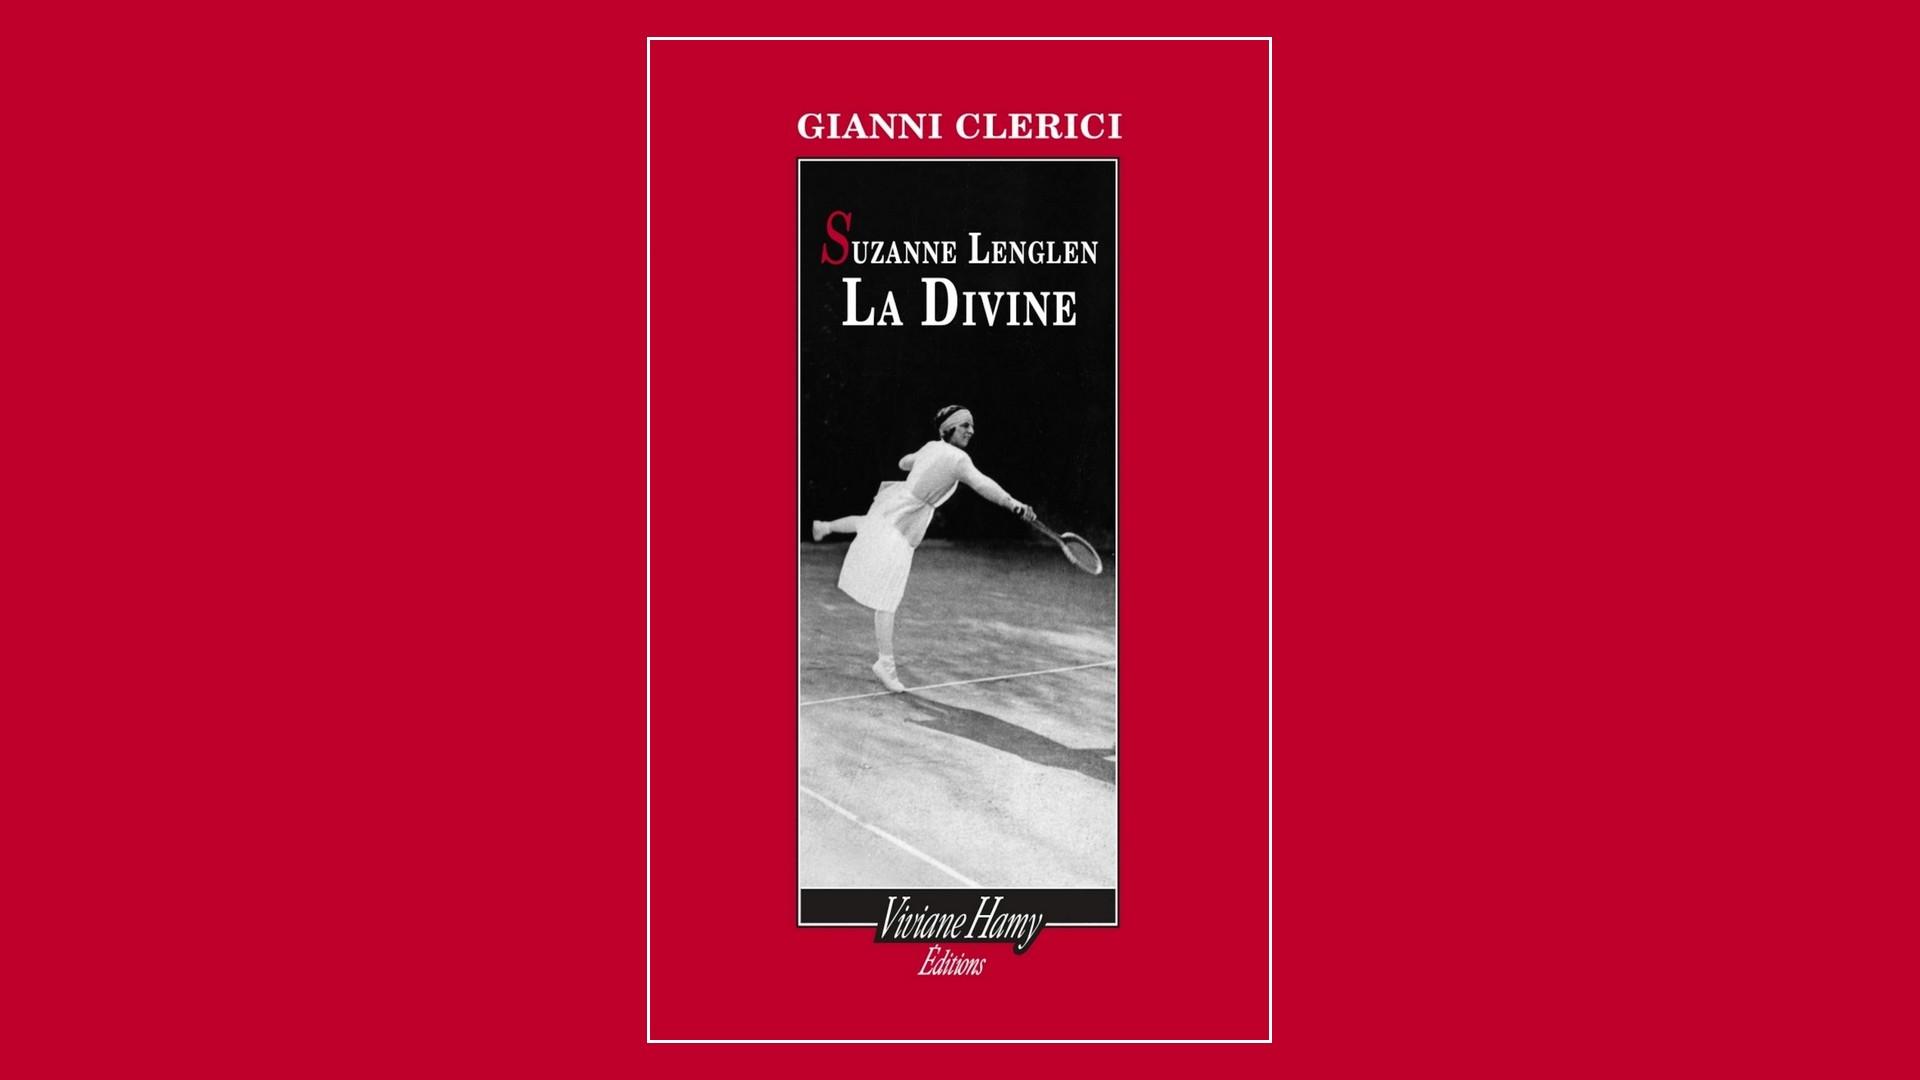 Livres – Suzanne Lenglen La Divine – Gianni Clerici (2021)